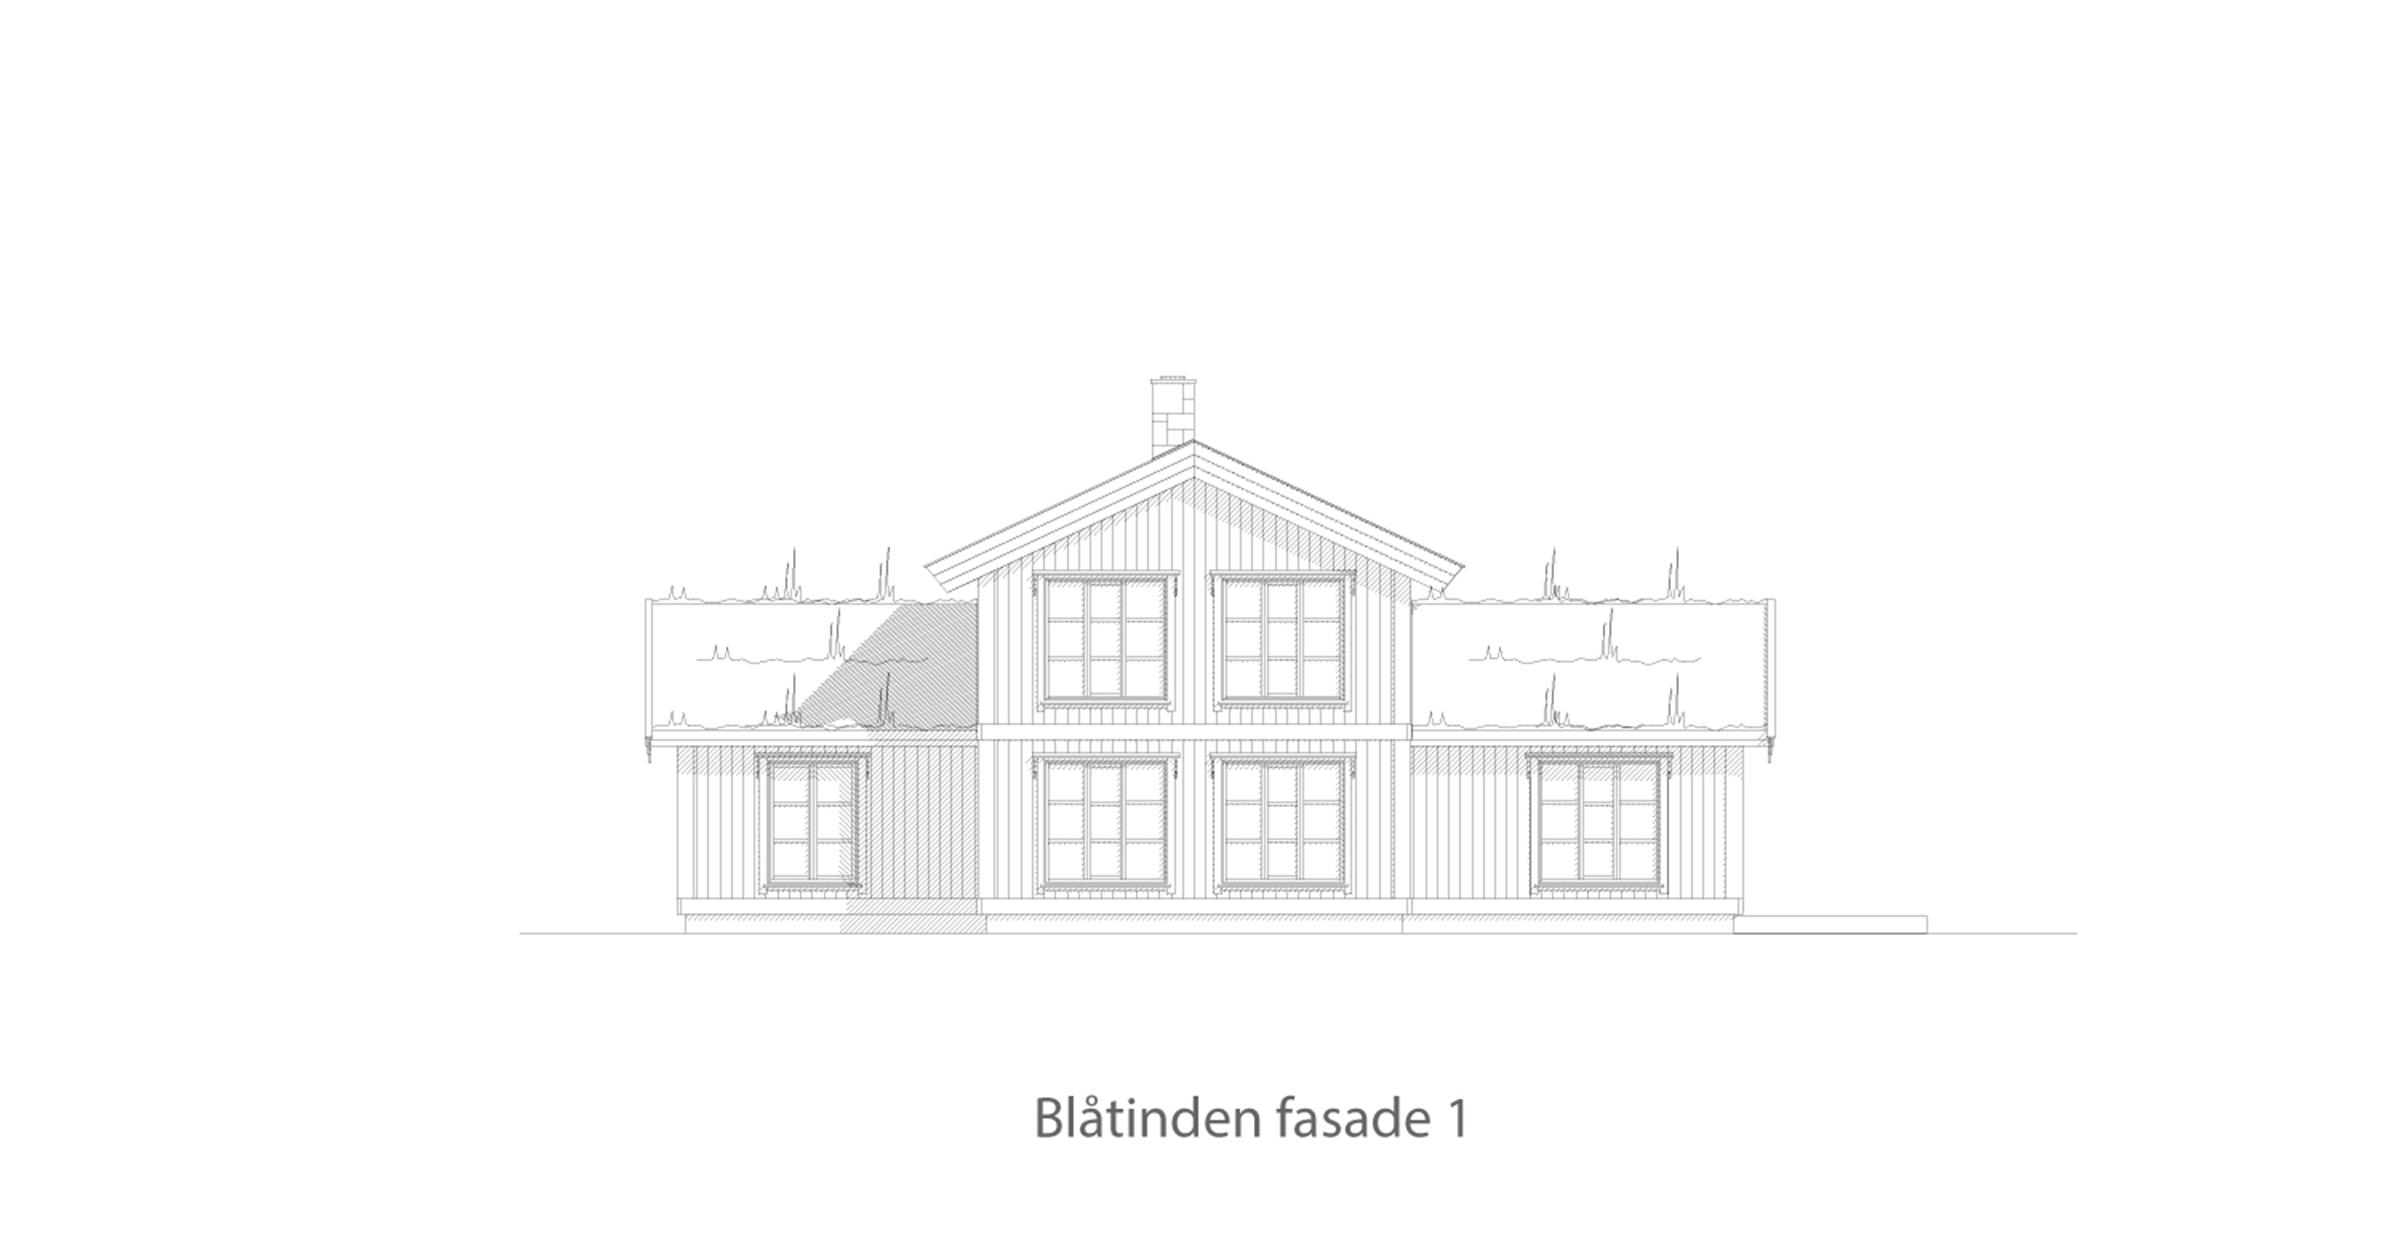 Blåtinden fasade 1